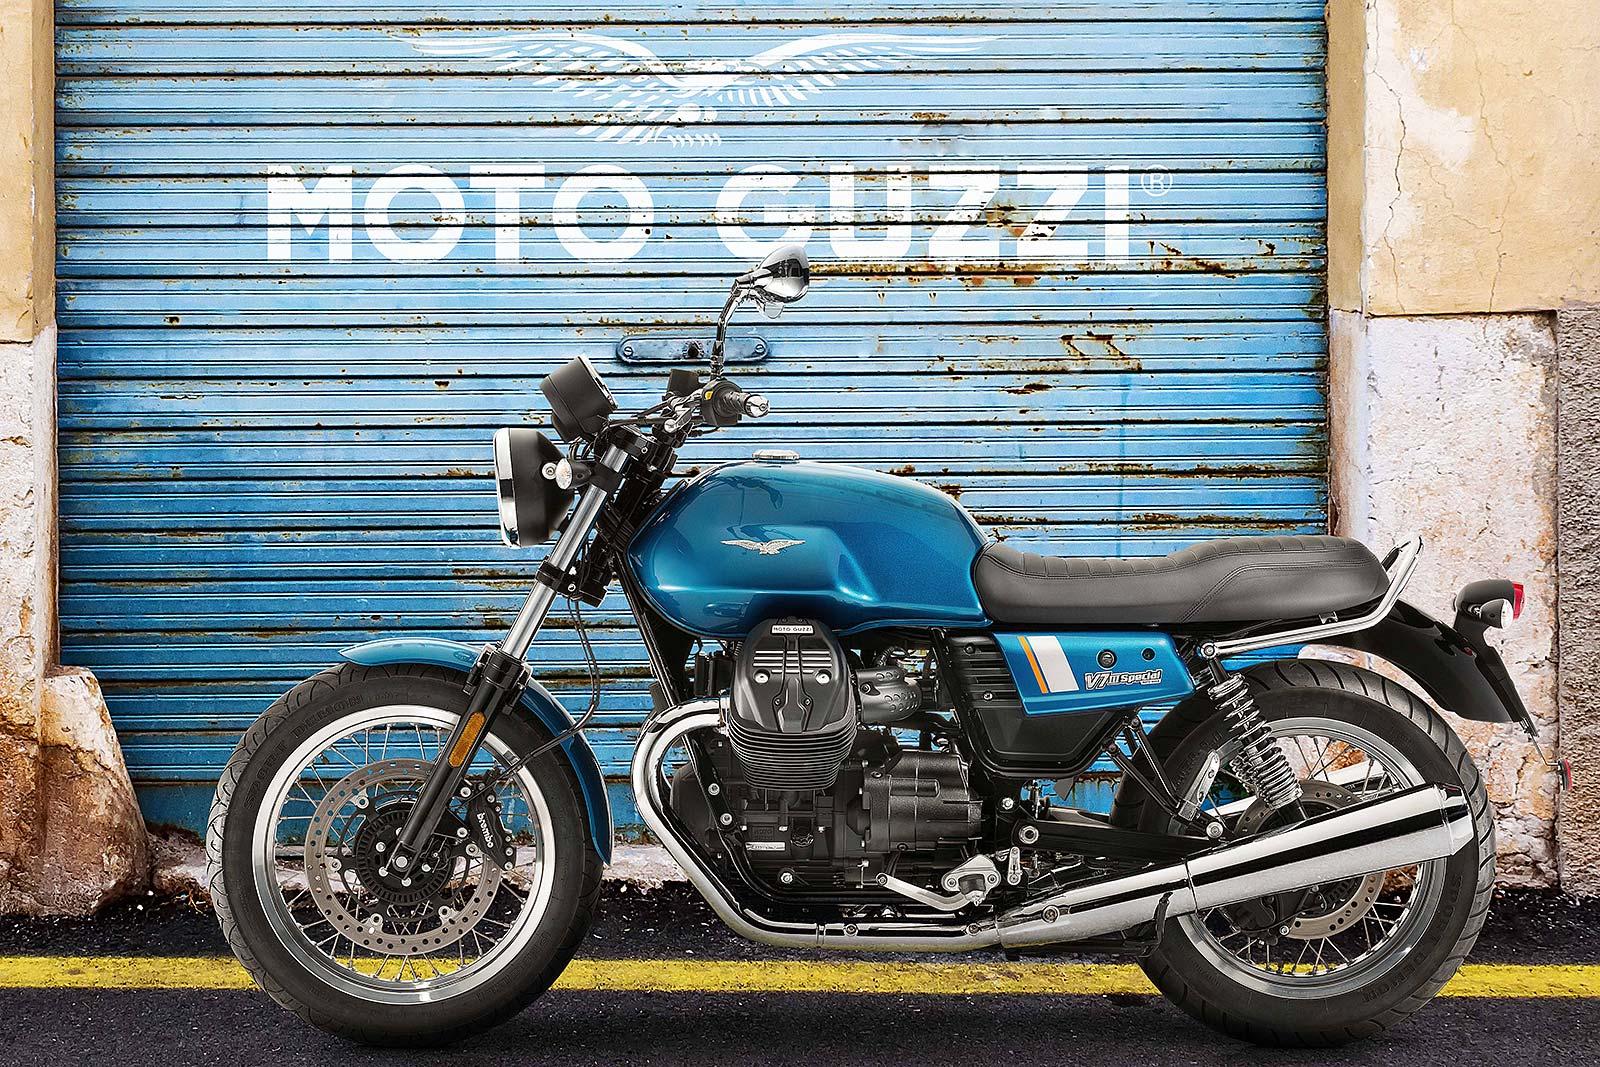 moto-guzzi-v7iii-special